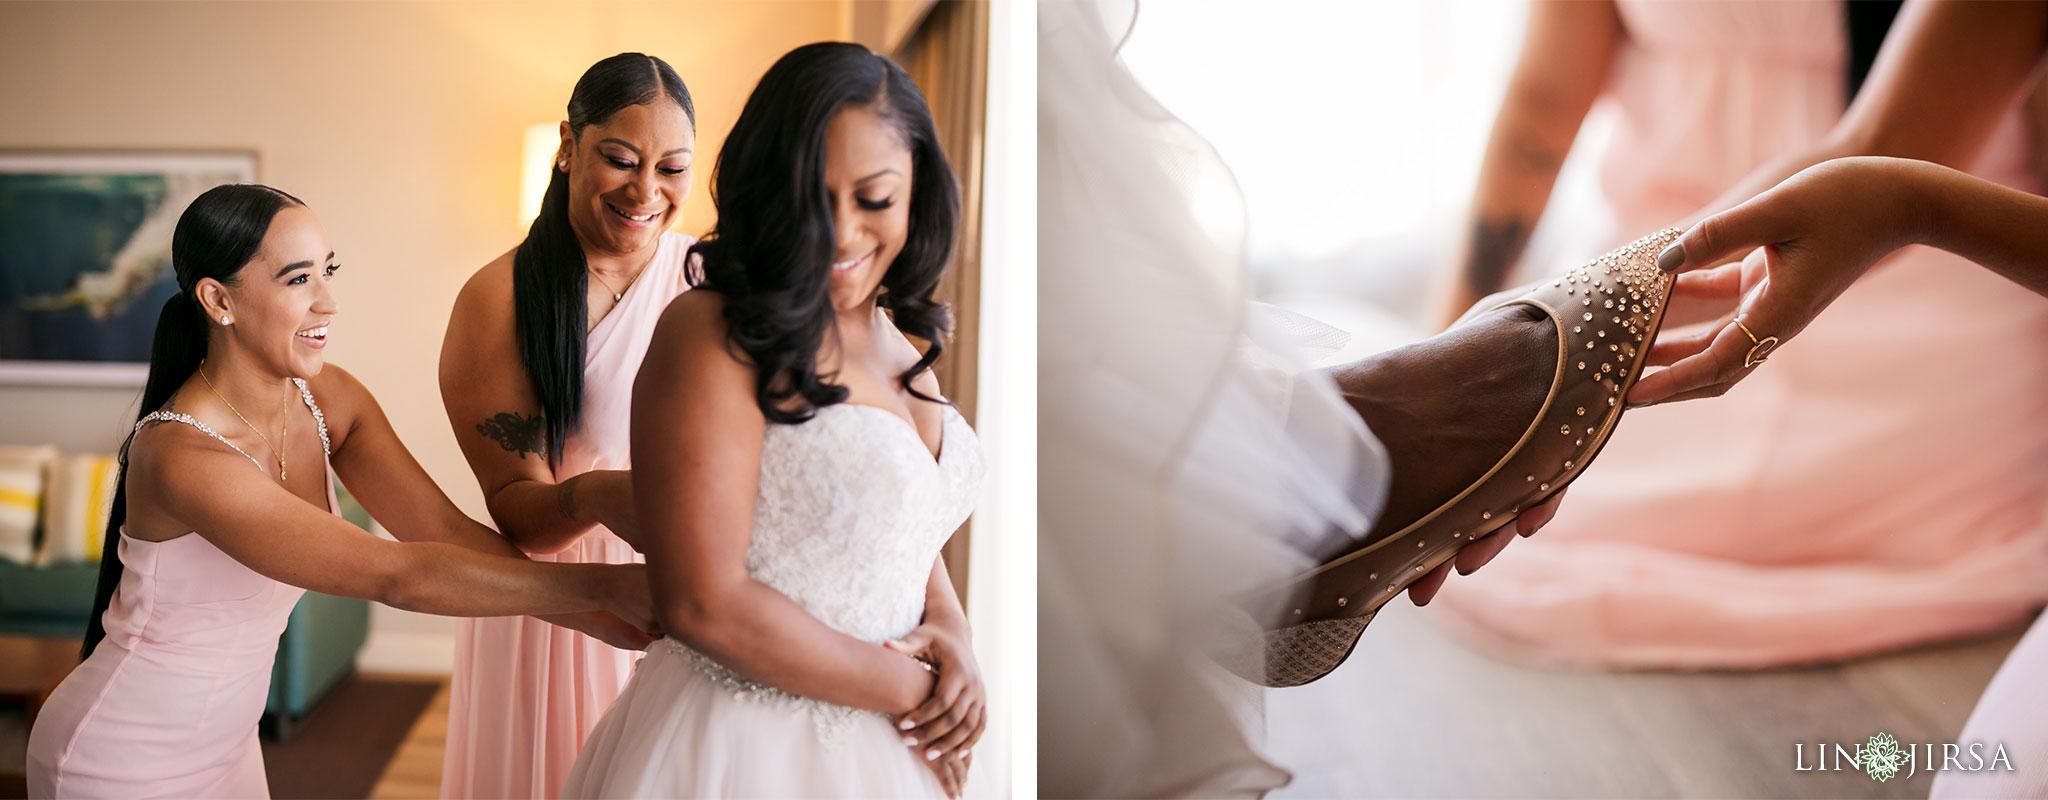 04 Verandas Beach House Manhattan Beach Wedding Photography